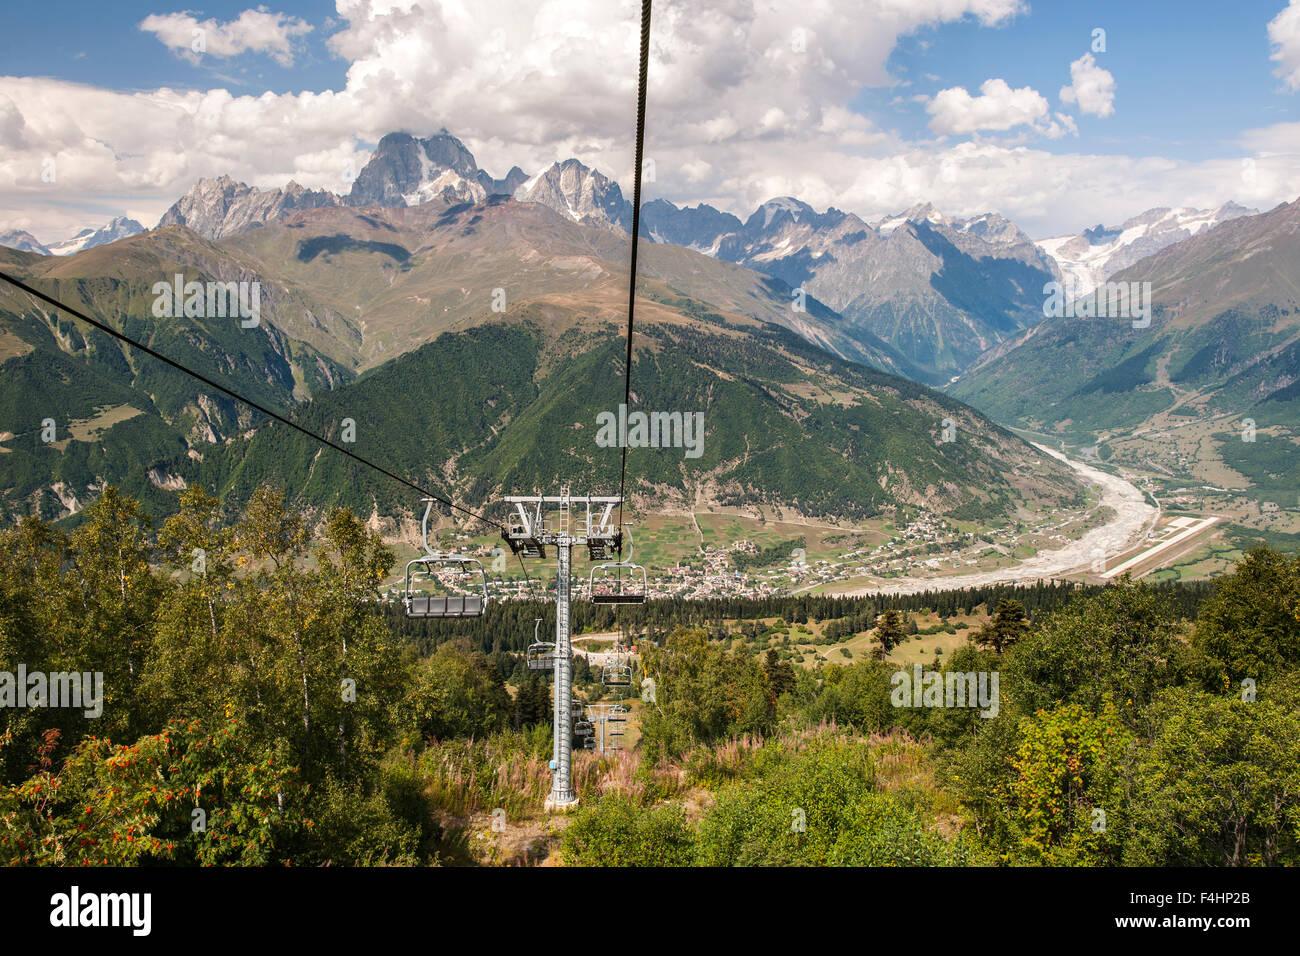 Mestia village and Mount Ushba (4710m) seen from the Hatsvali ski lift in the Svaneti region of northwestern Georgia. - Stock Image